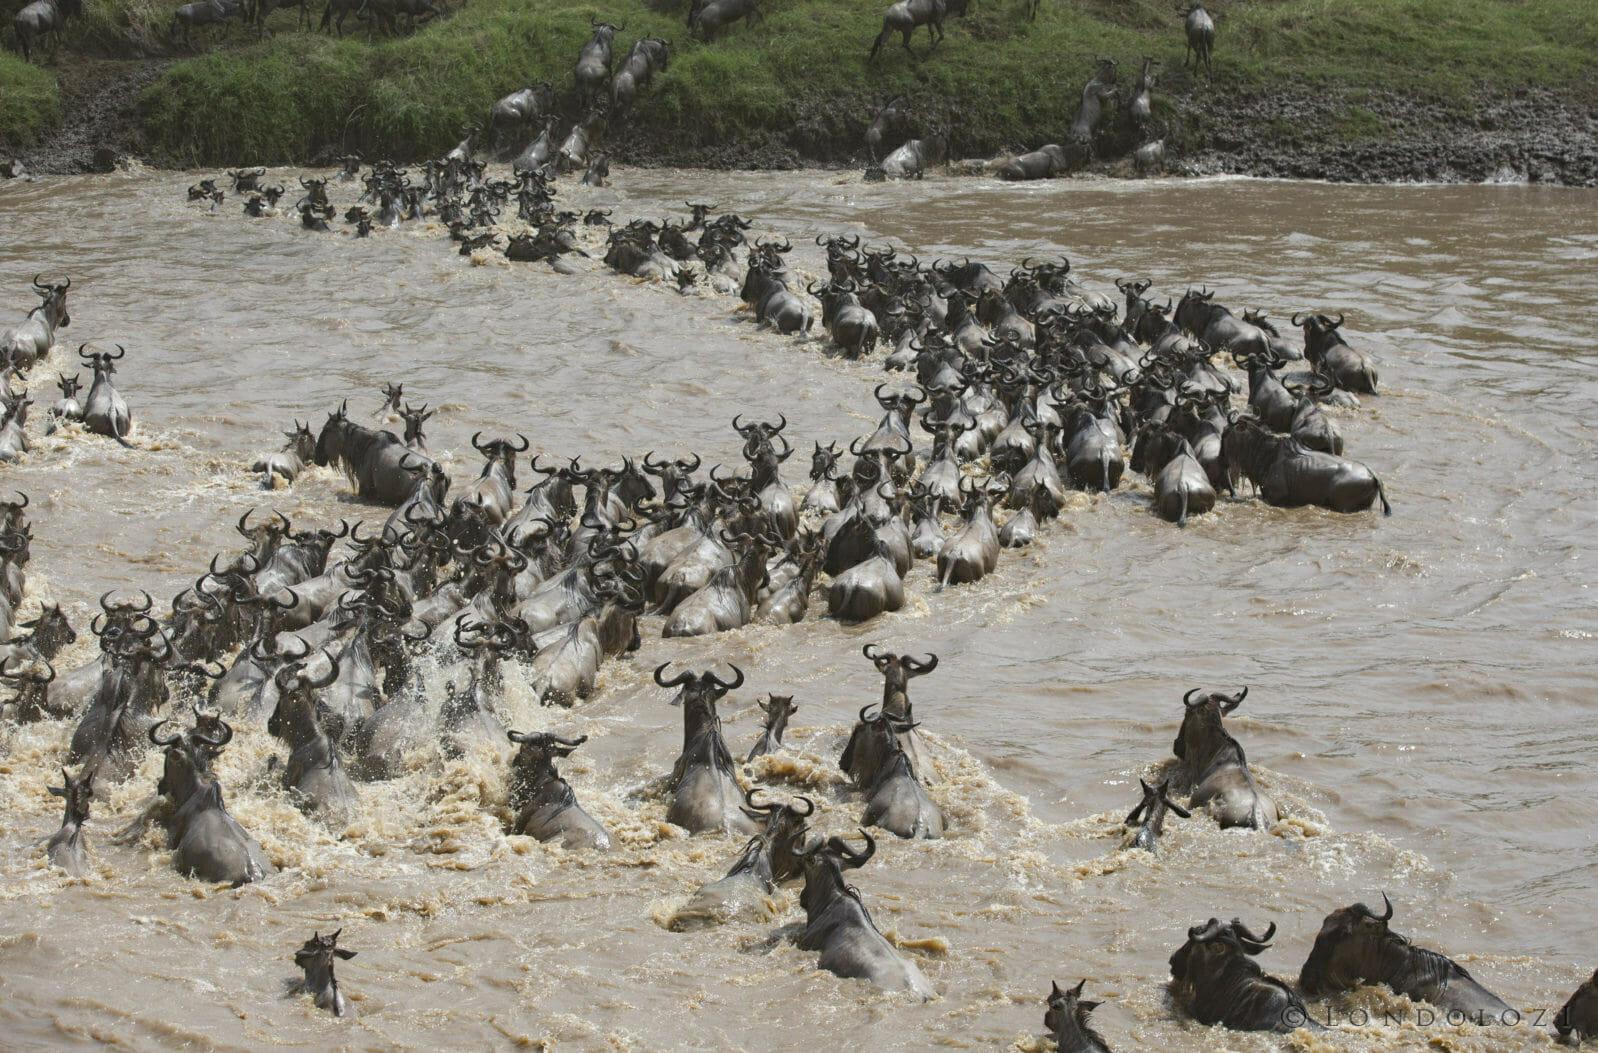 Wildbeest Crossing Jt